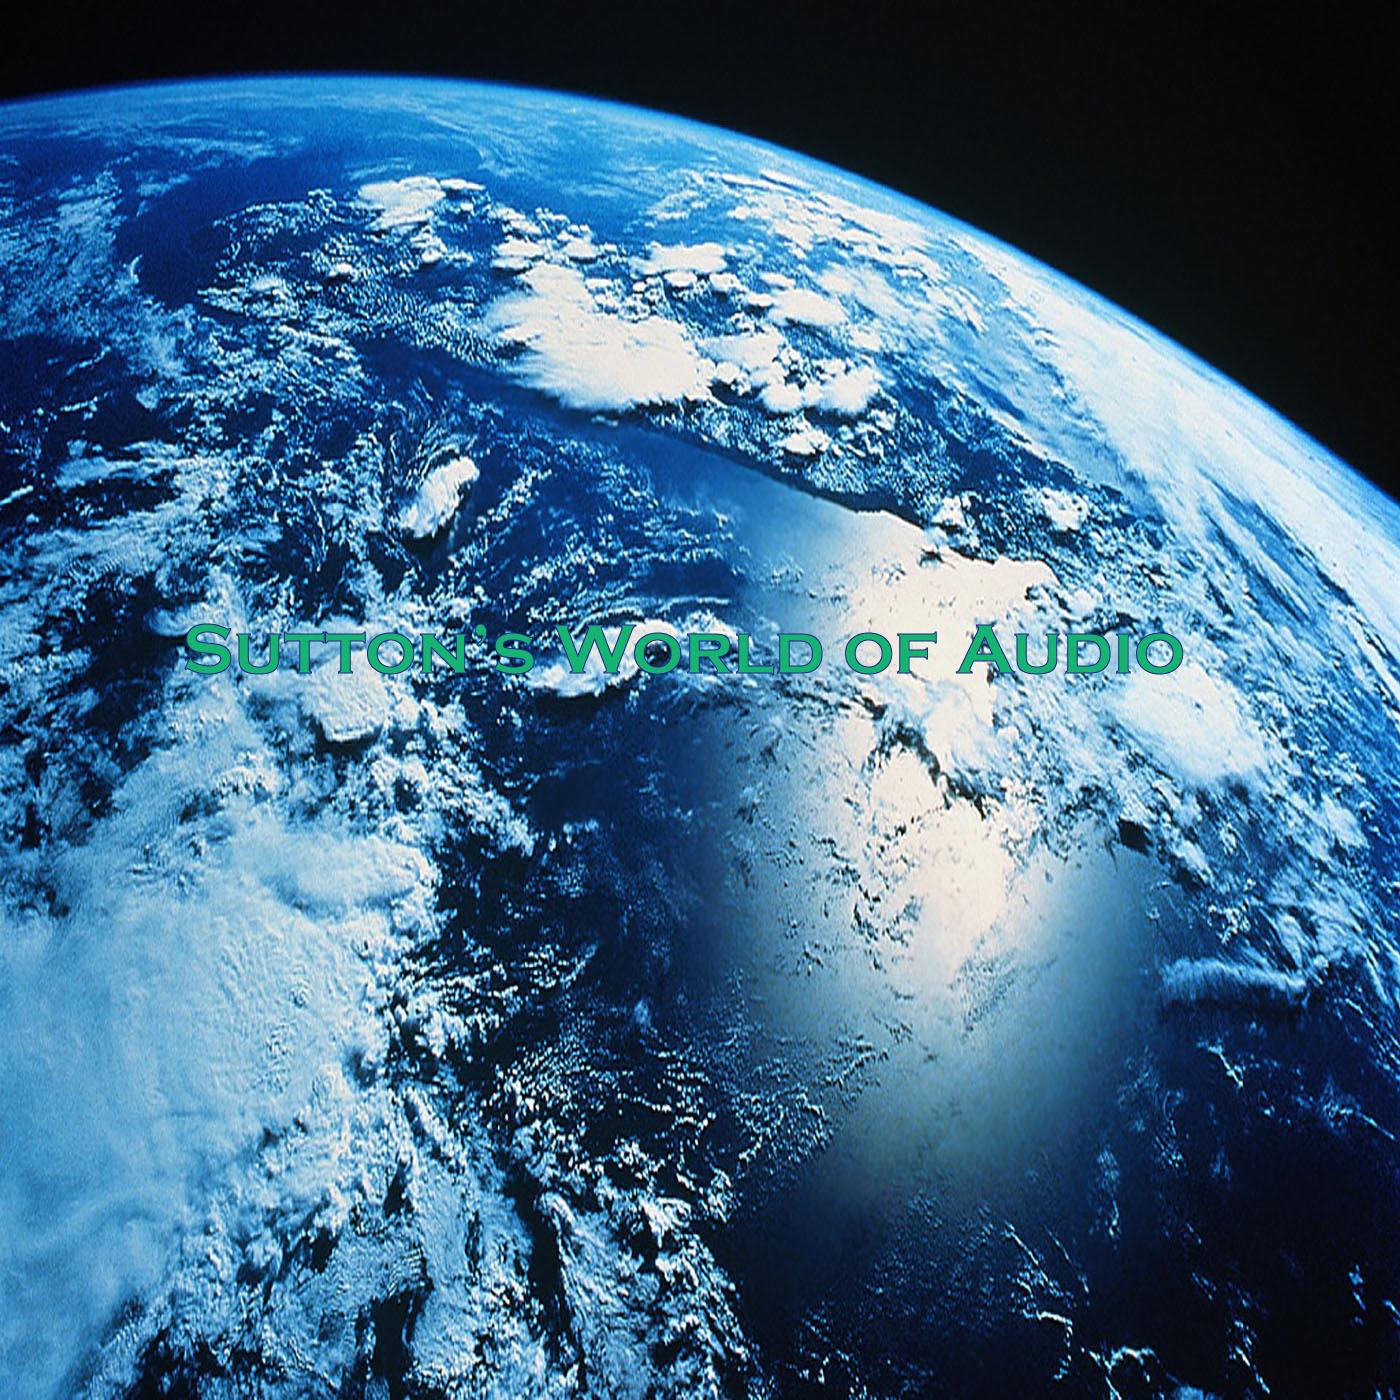 Sutton's World of Audio